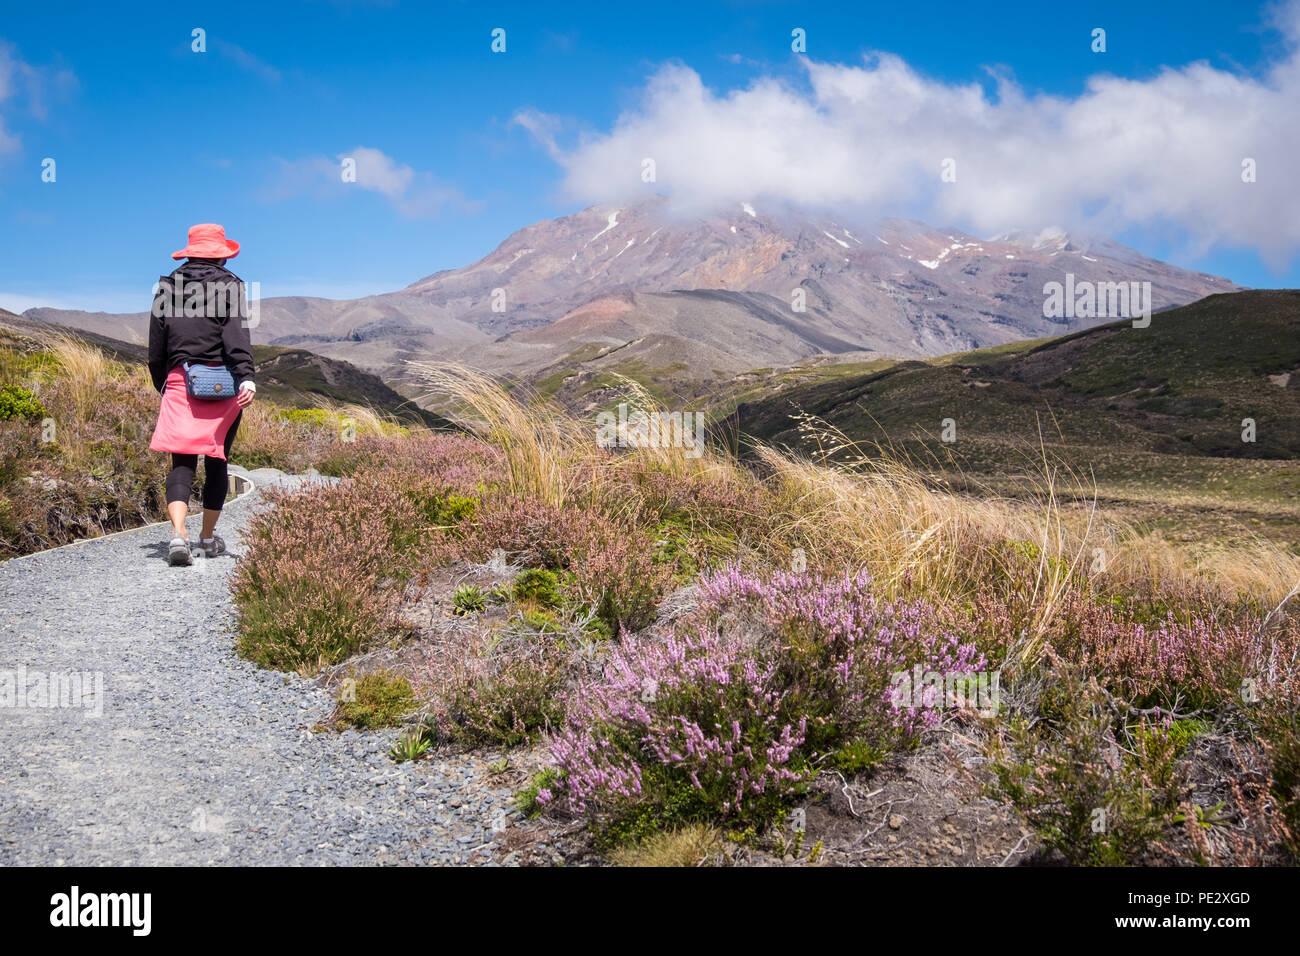 A woman walking towards Mt Ruapehu in the Tongariro National Park - Stock Image